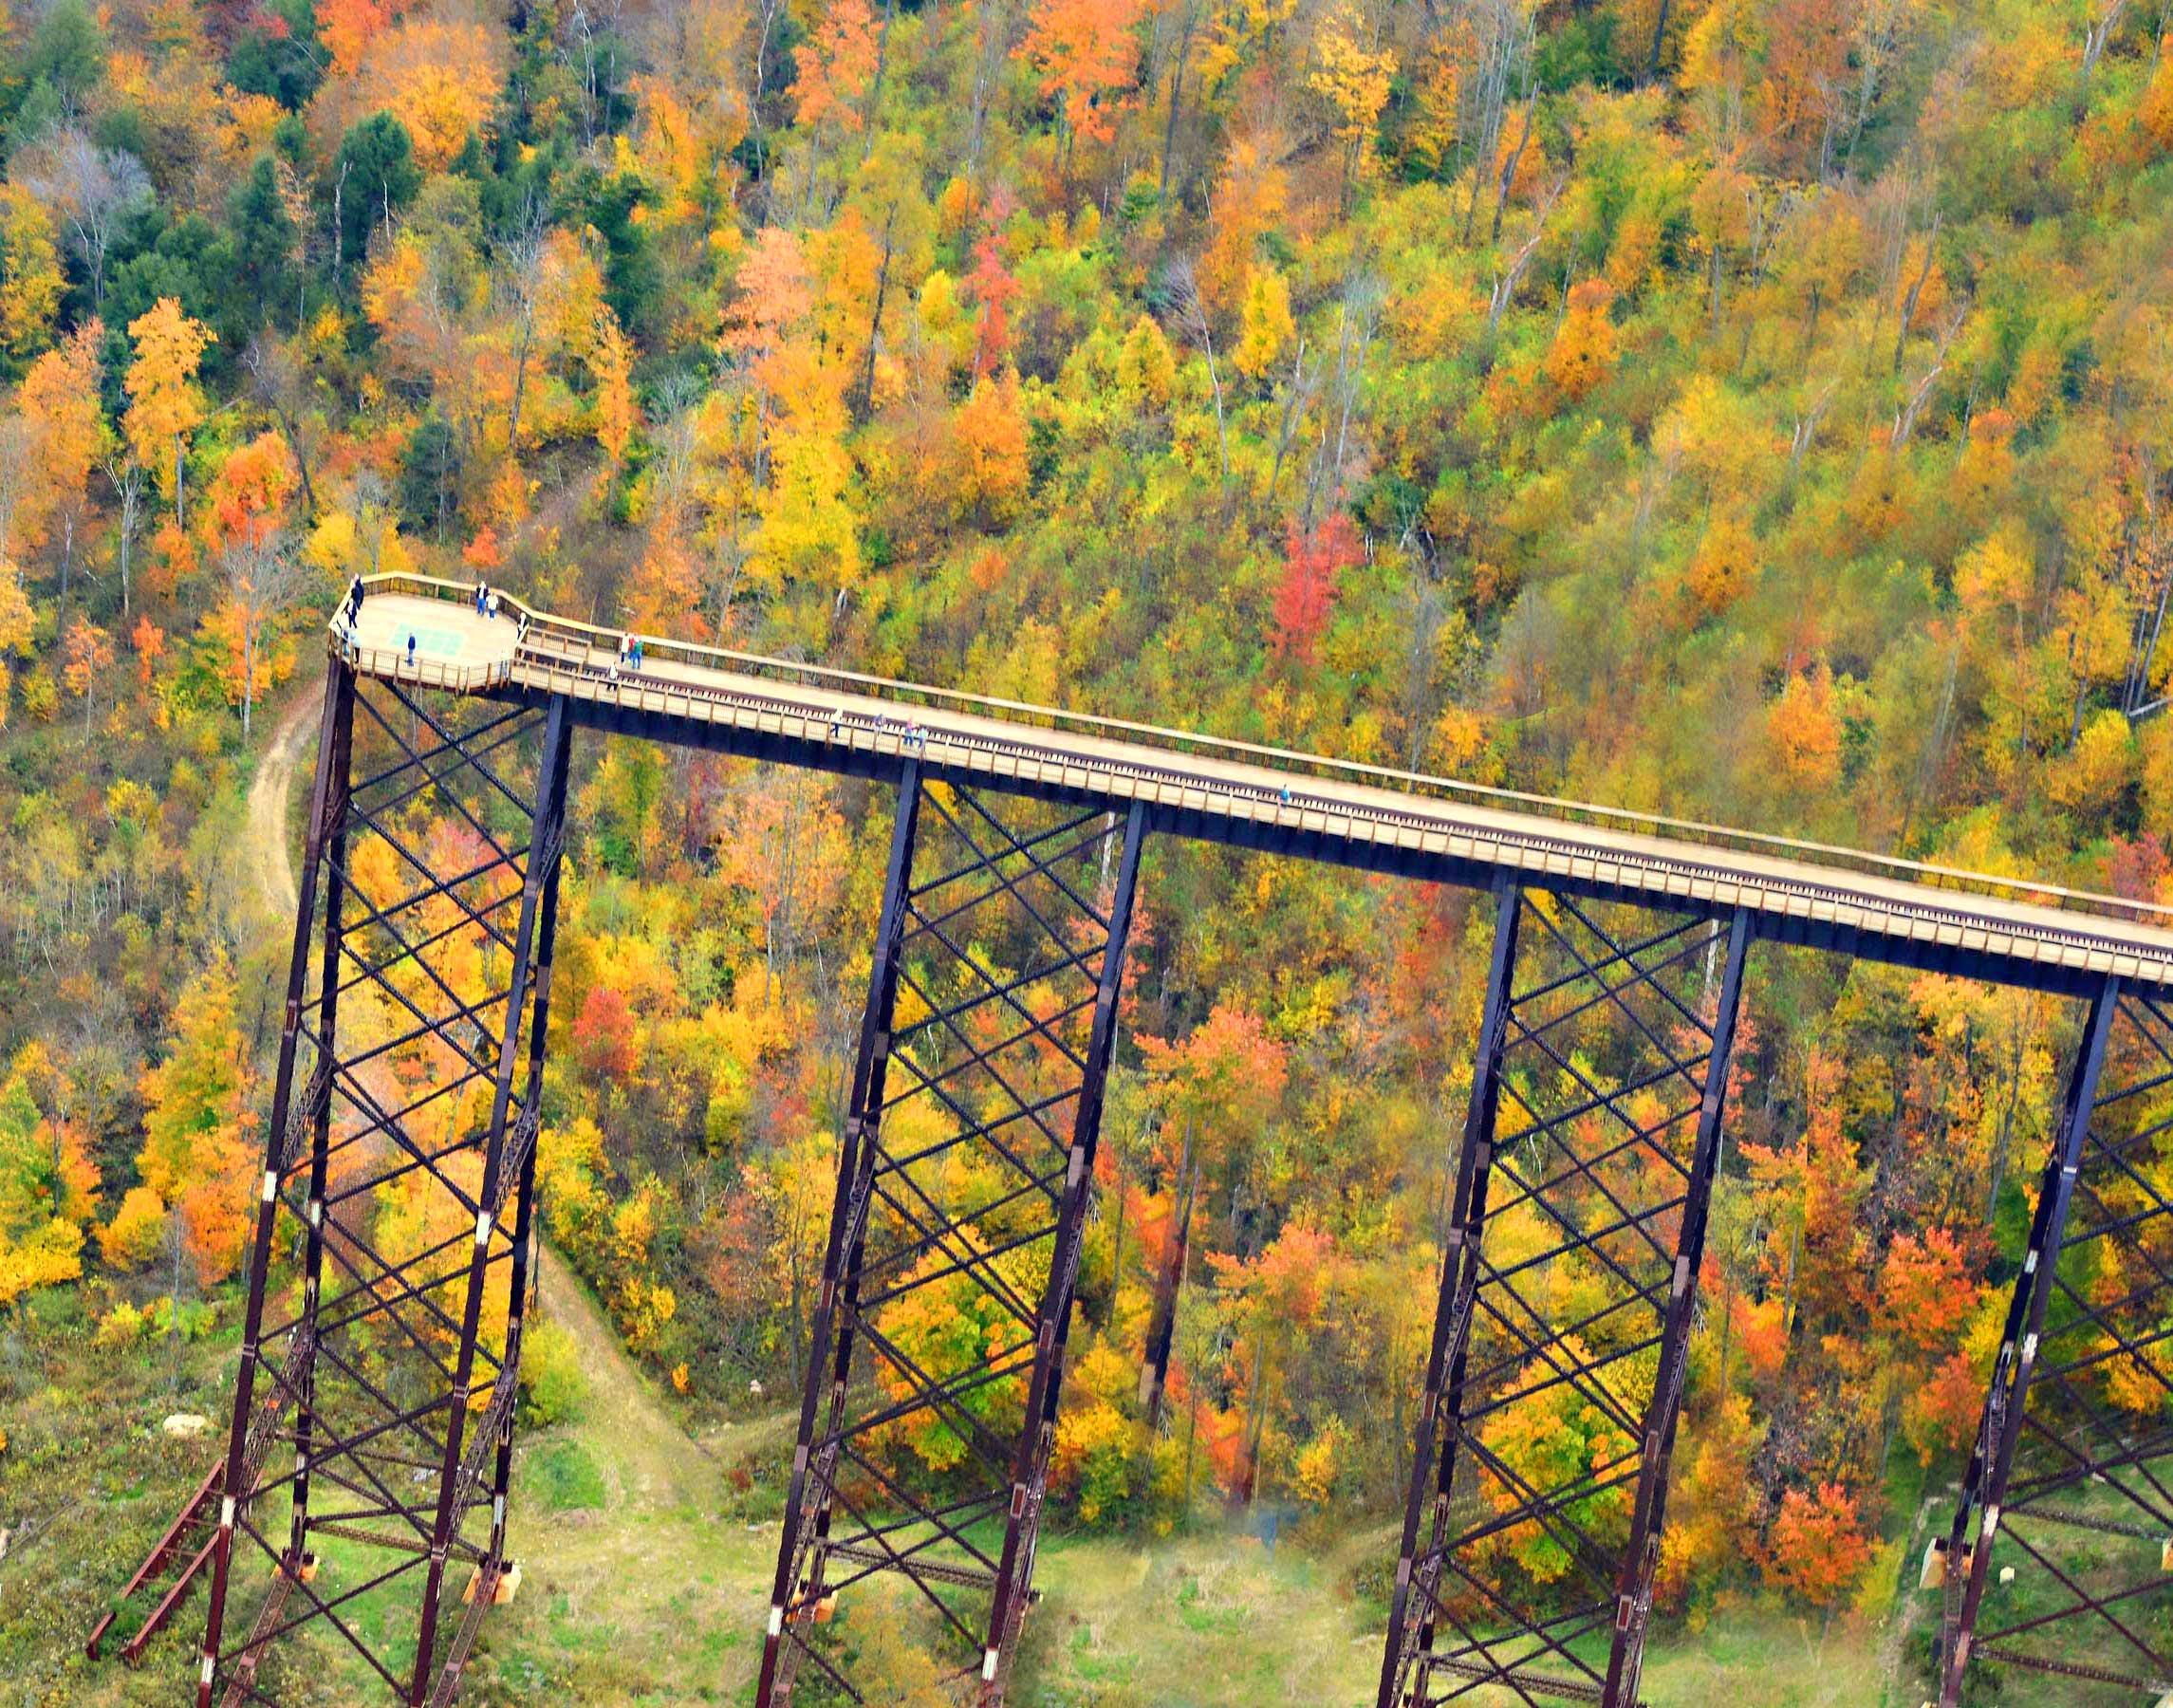 Allegheny National Forest Visitors Bureau